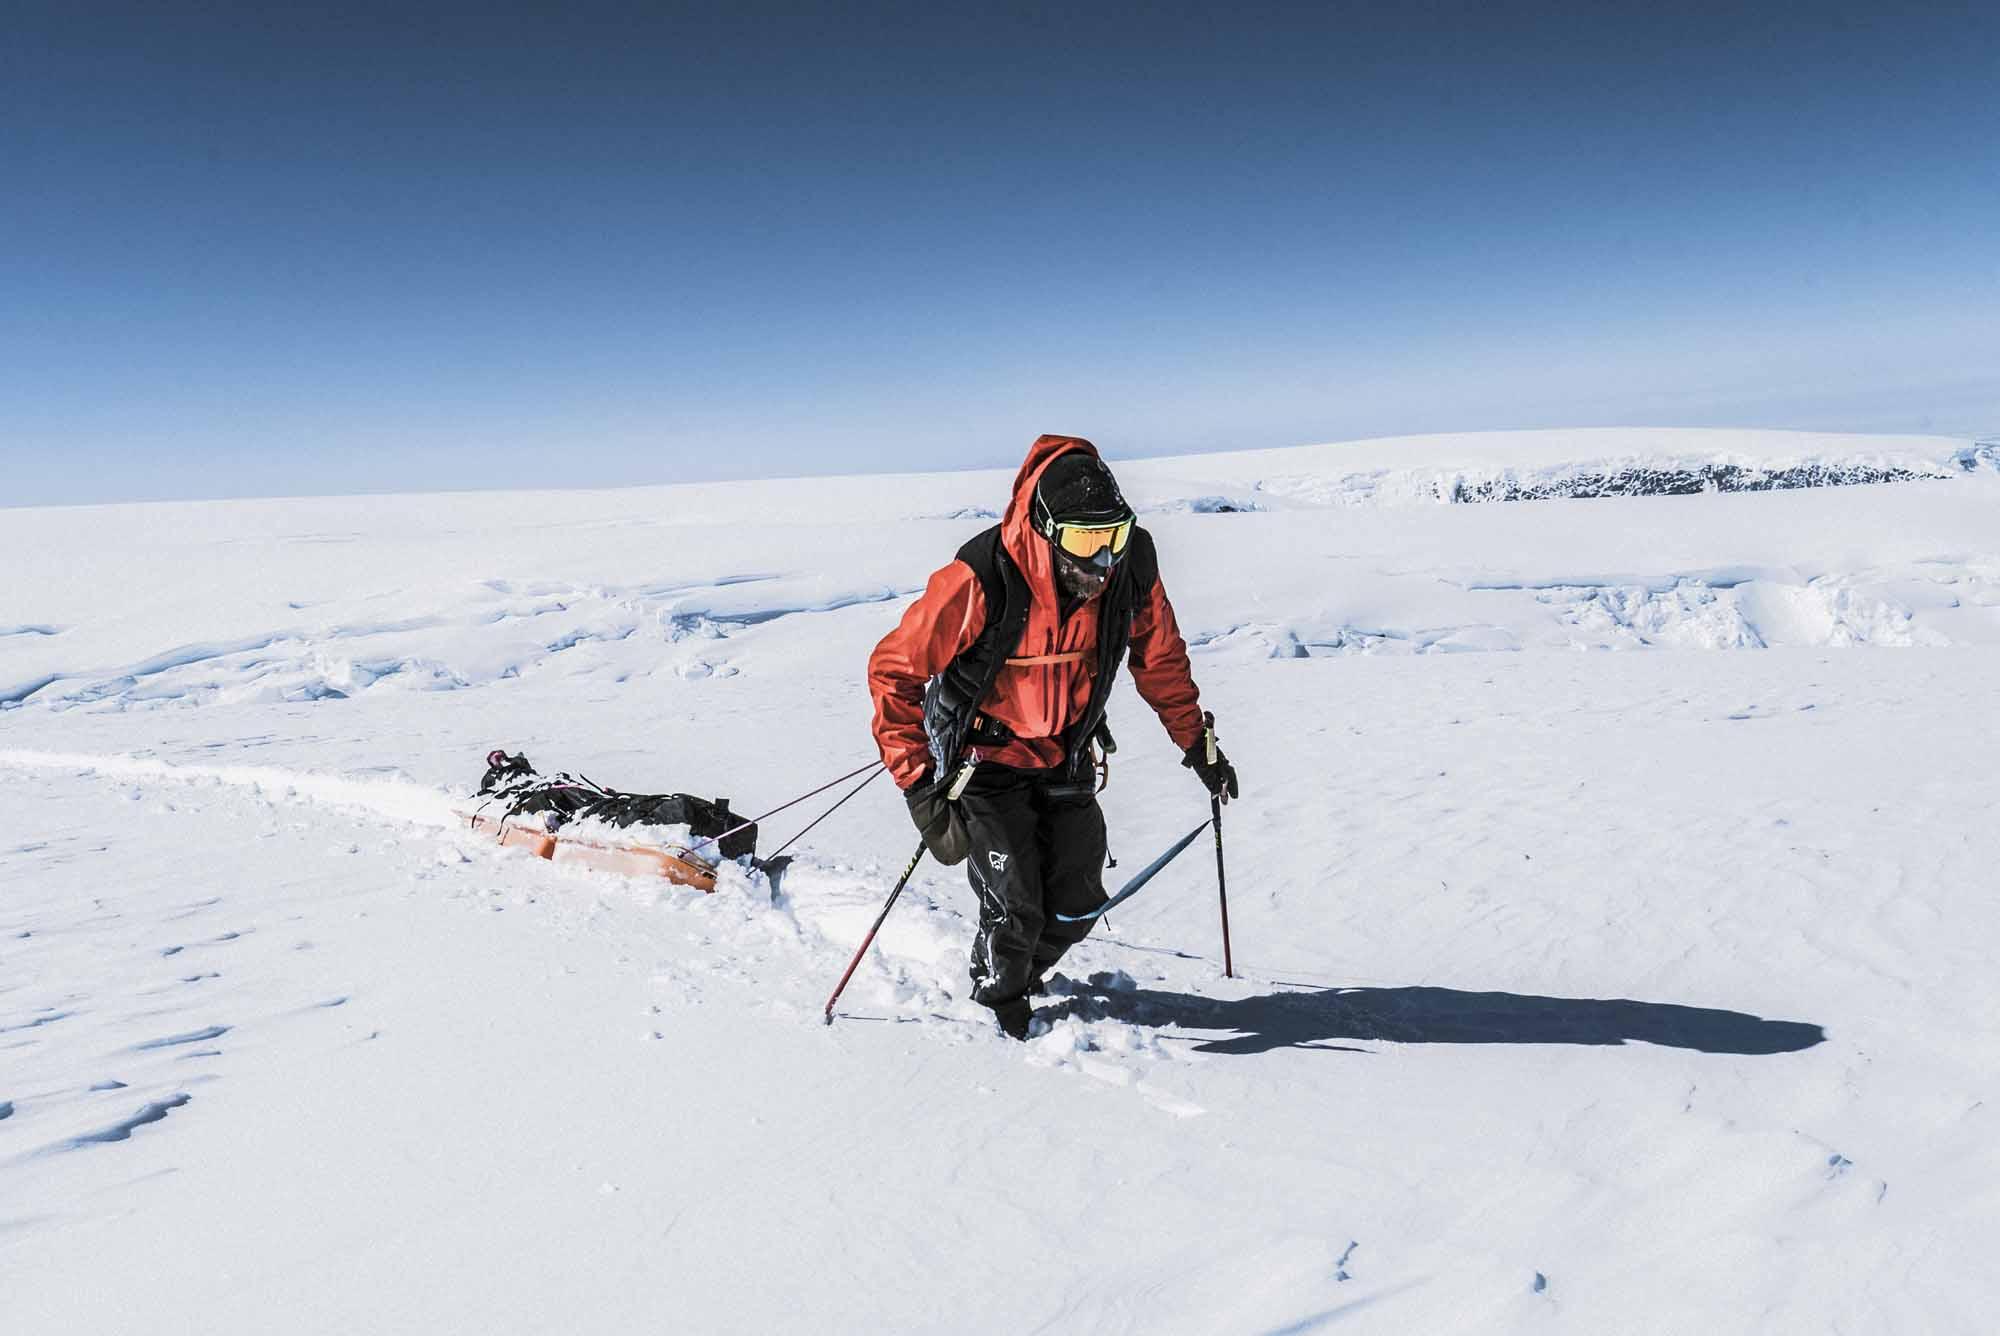 Polar-Quest-Exploration-Polaire-Exploring-Boundaries-in-Antarctica-Caroline-Cote-photo-man-and-sled